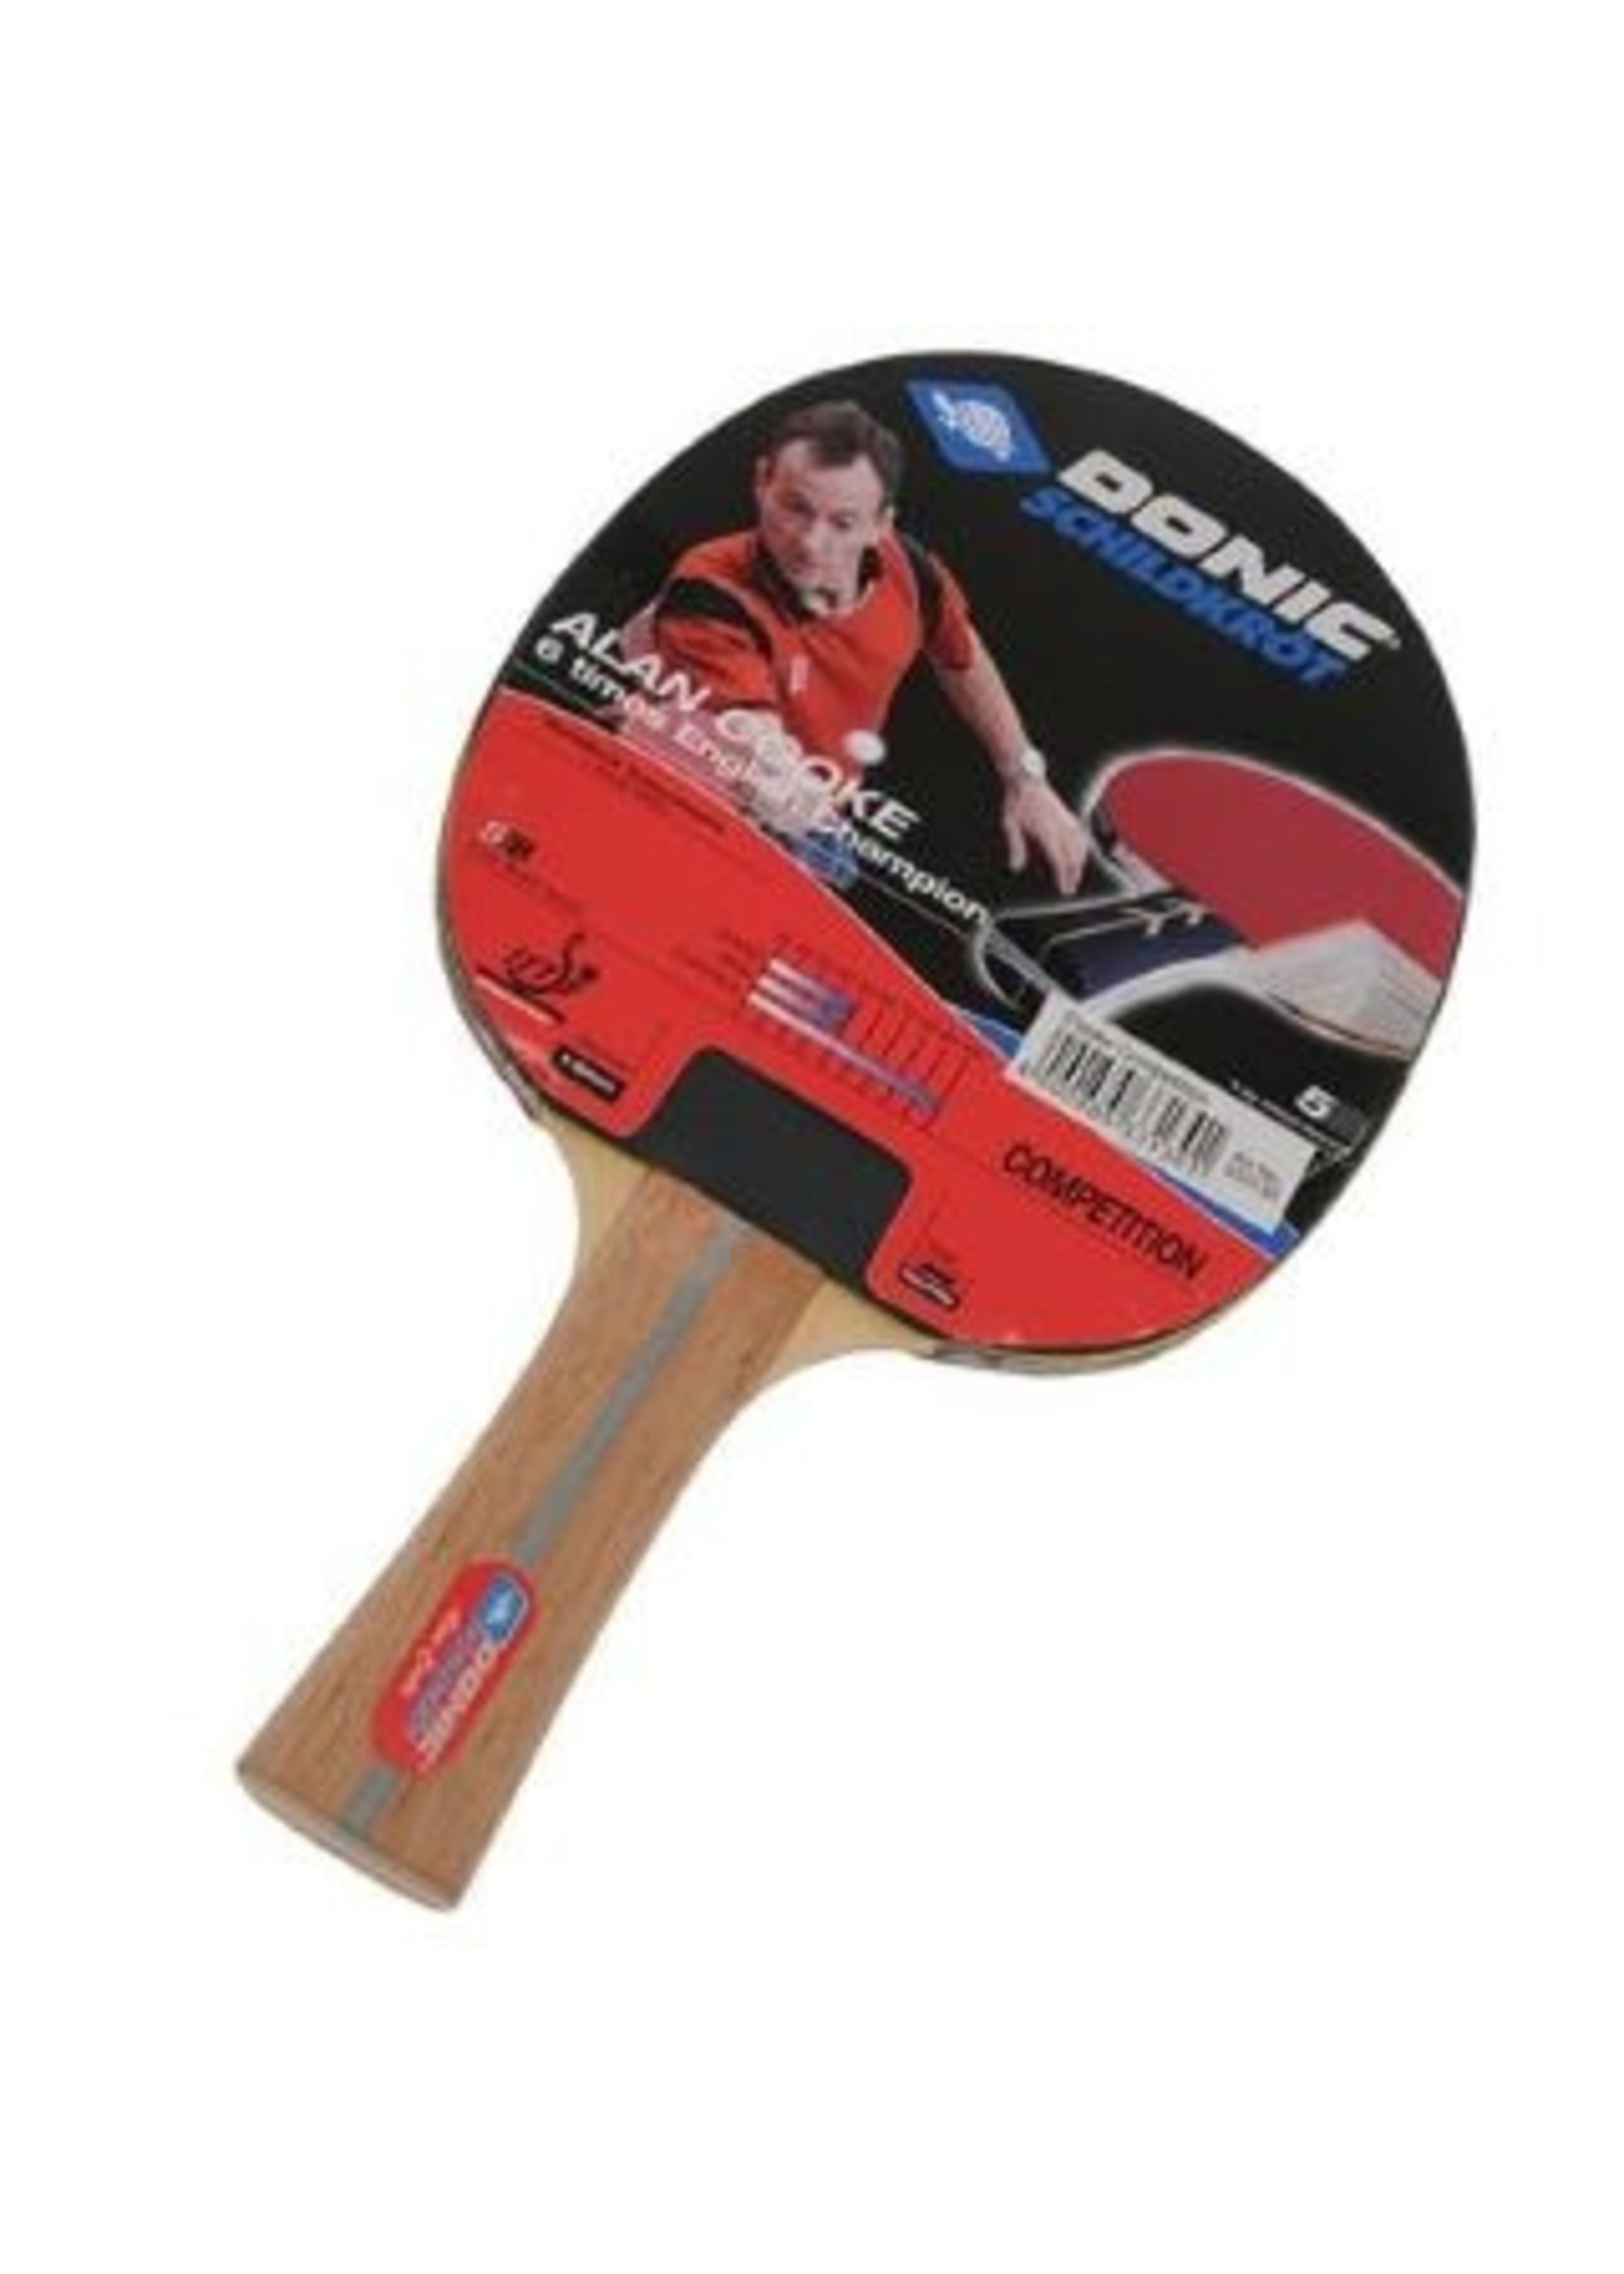 Donic Schildkrot Alan Cooke Schildkrot Competition Table Tennis Bat